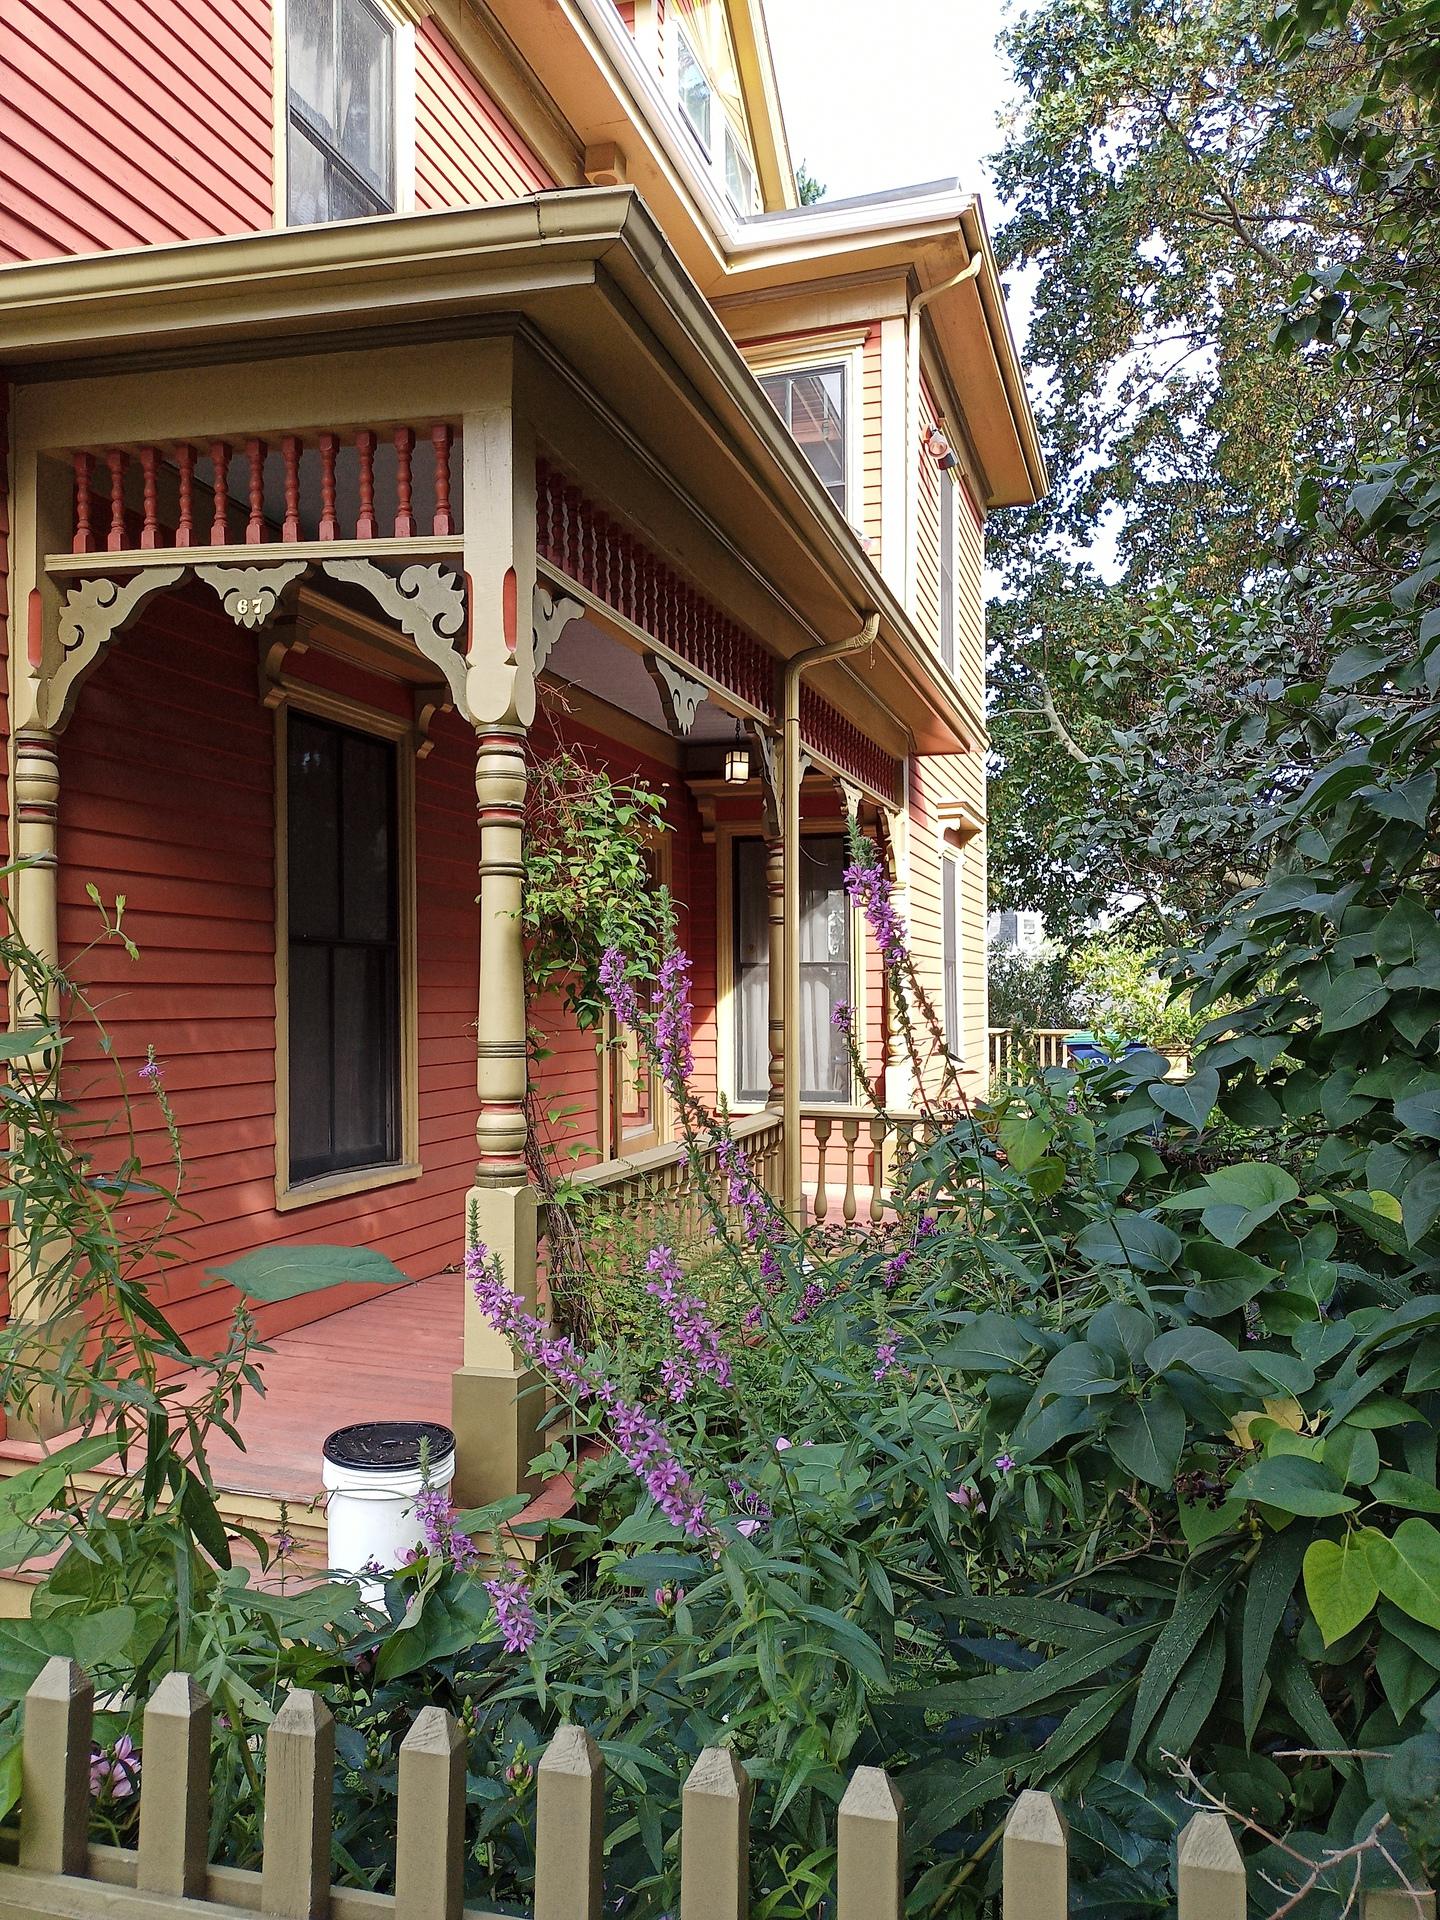 Picture of house in Massachusetts taken on Blu G91 Pro